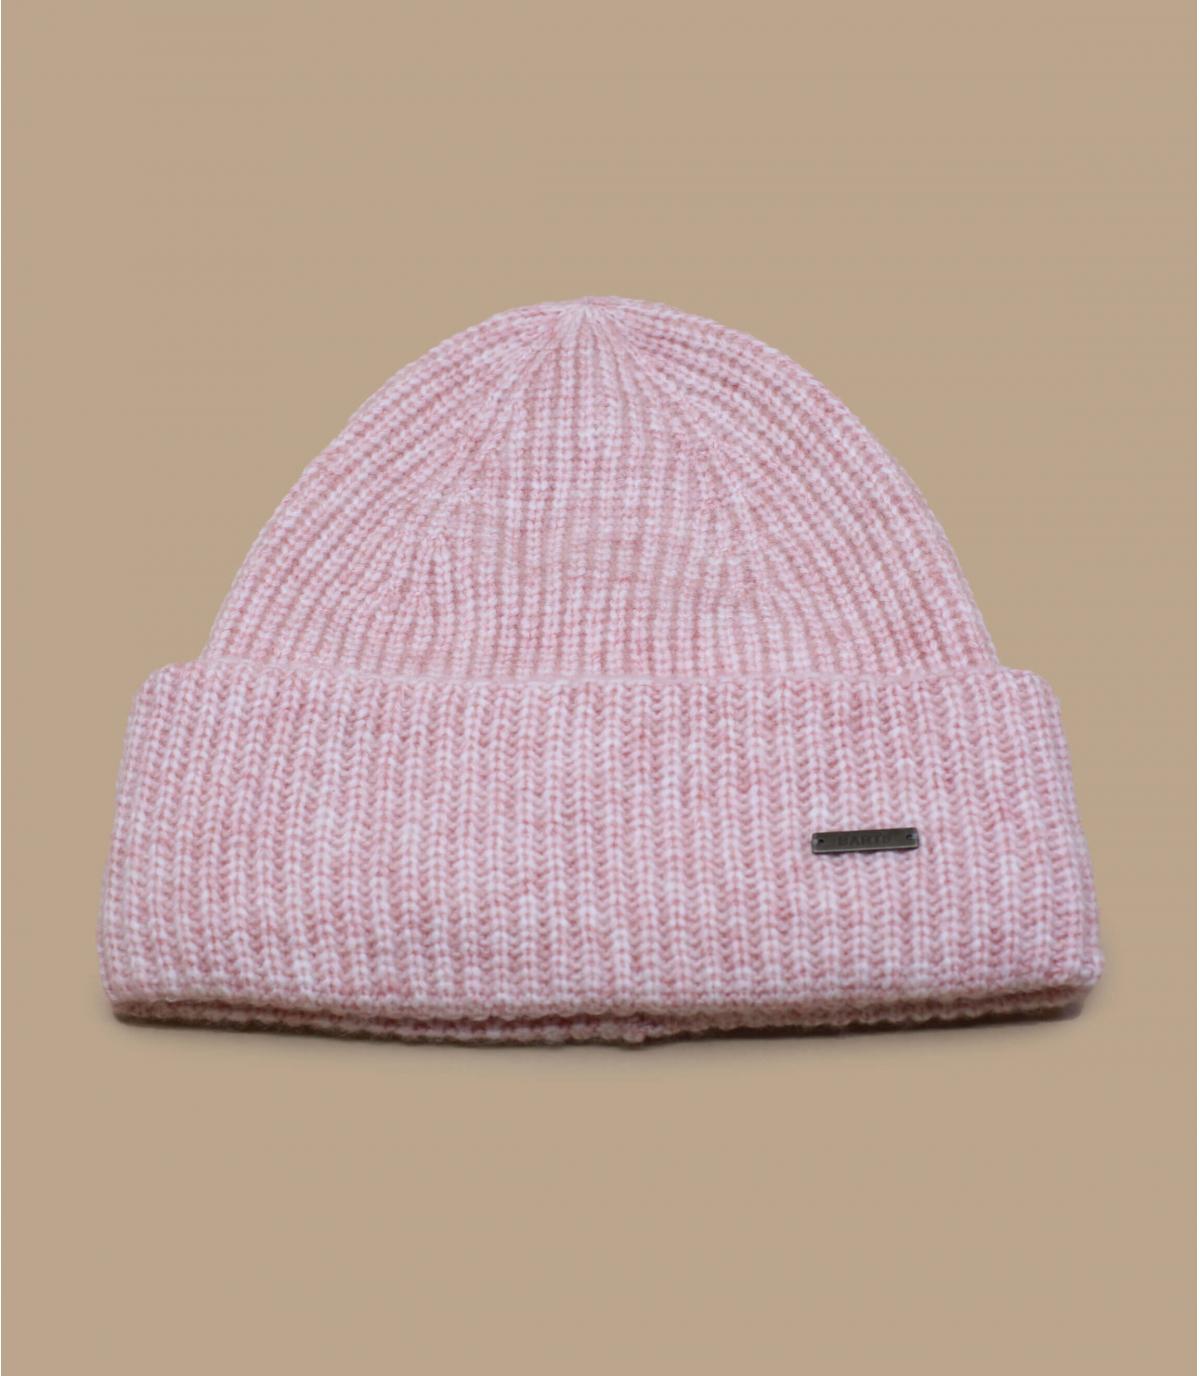 Detalles Preeda Beanie pink imagen 2